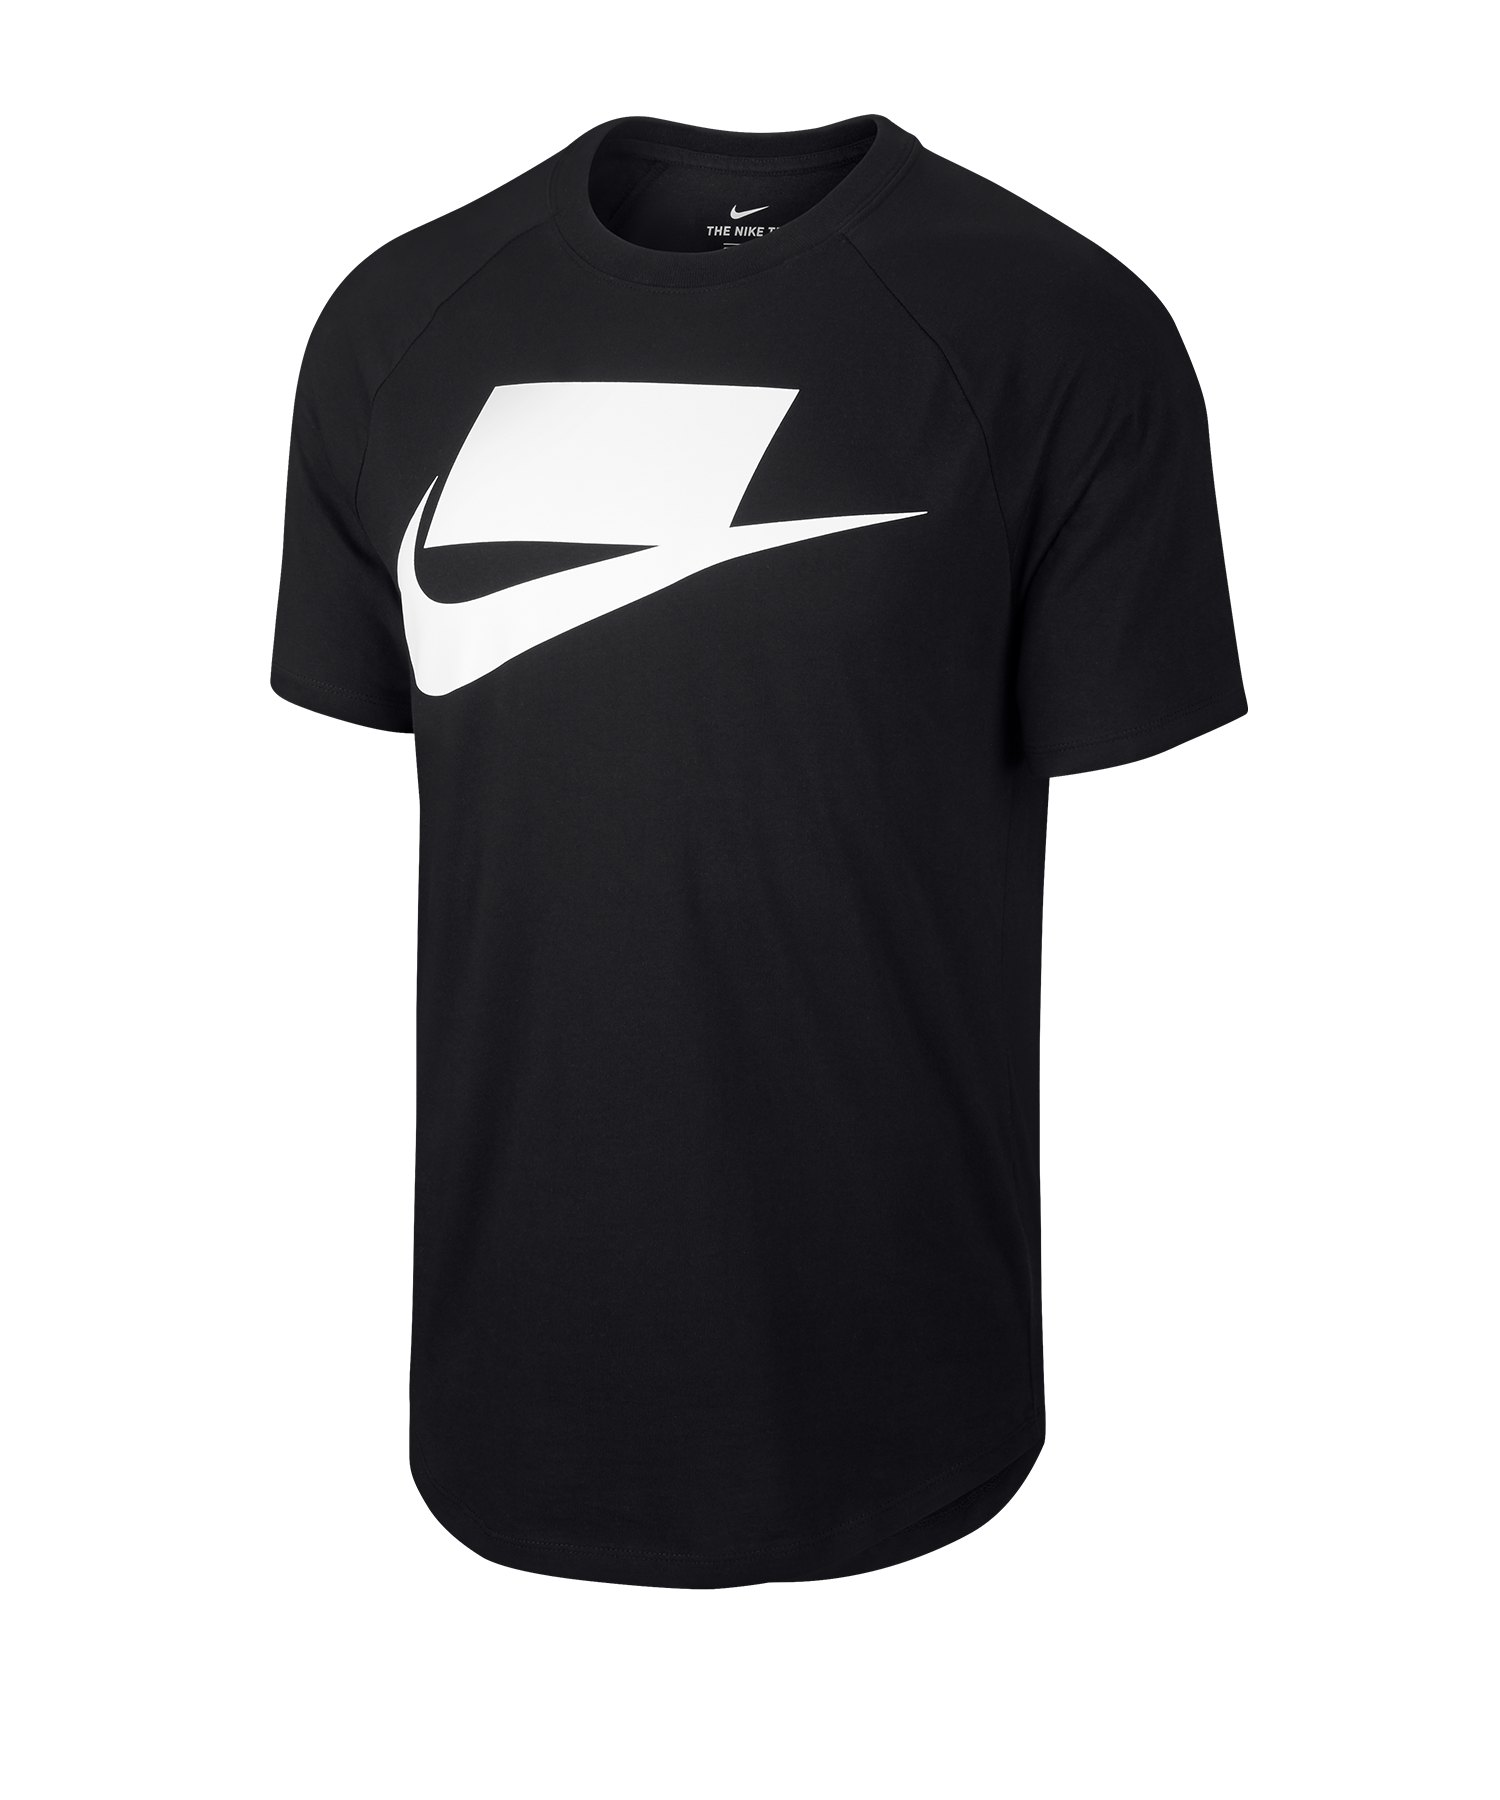 Nike Short Sleeve Tee T-Shir Schwarz F011 - schwarz